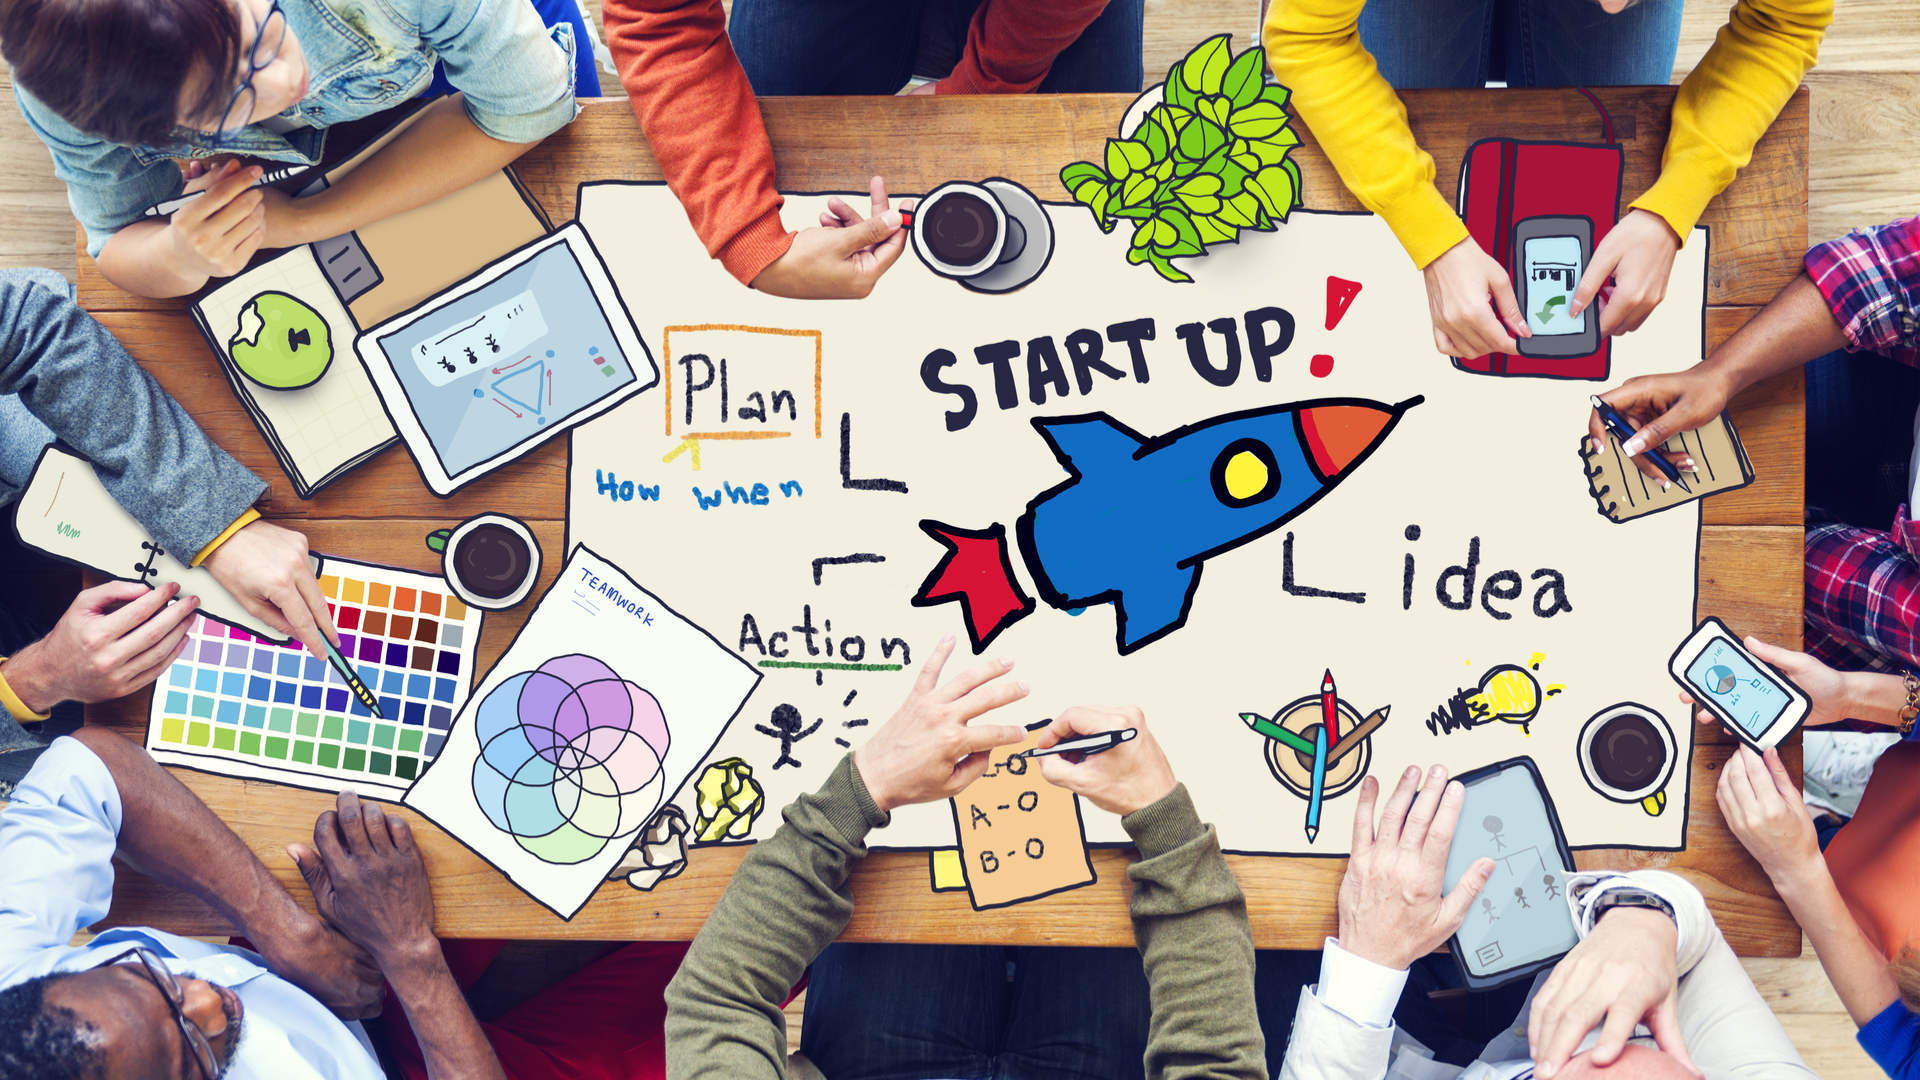 eProcurement ed eSupply Chain: per le startup innovative